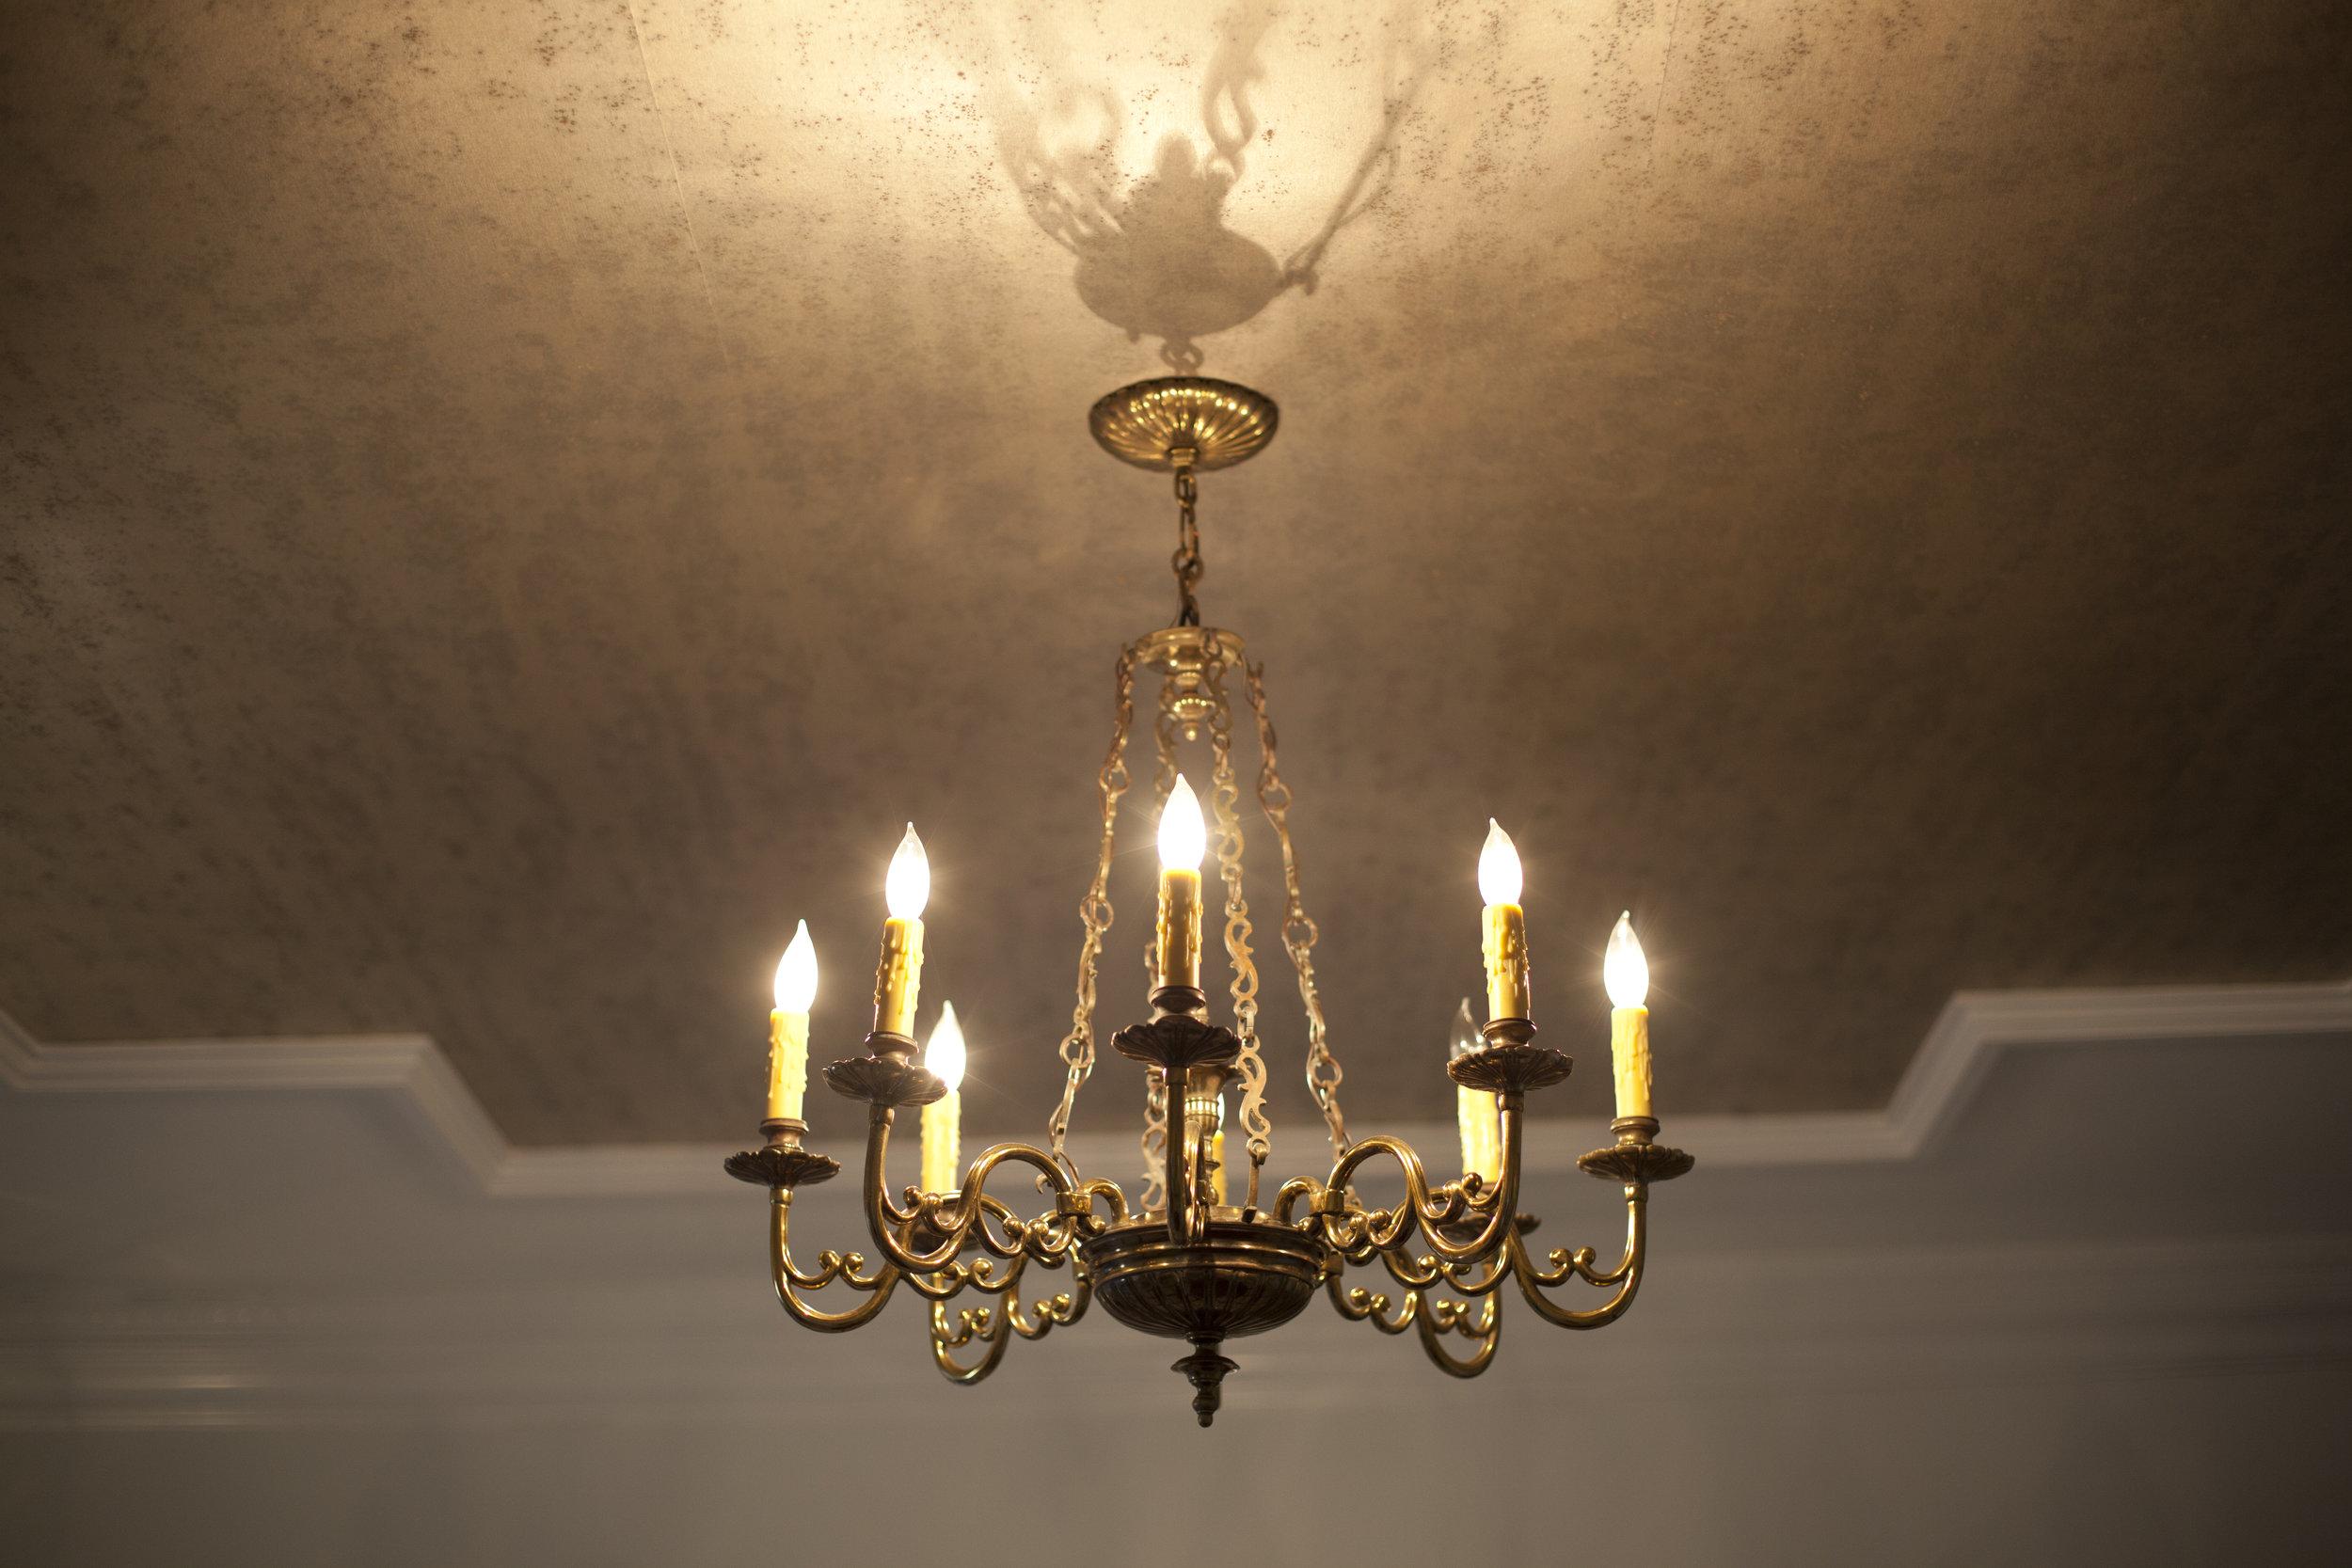 hall ceiling treatment.jpg